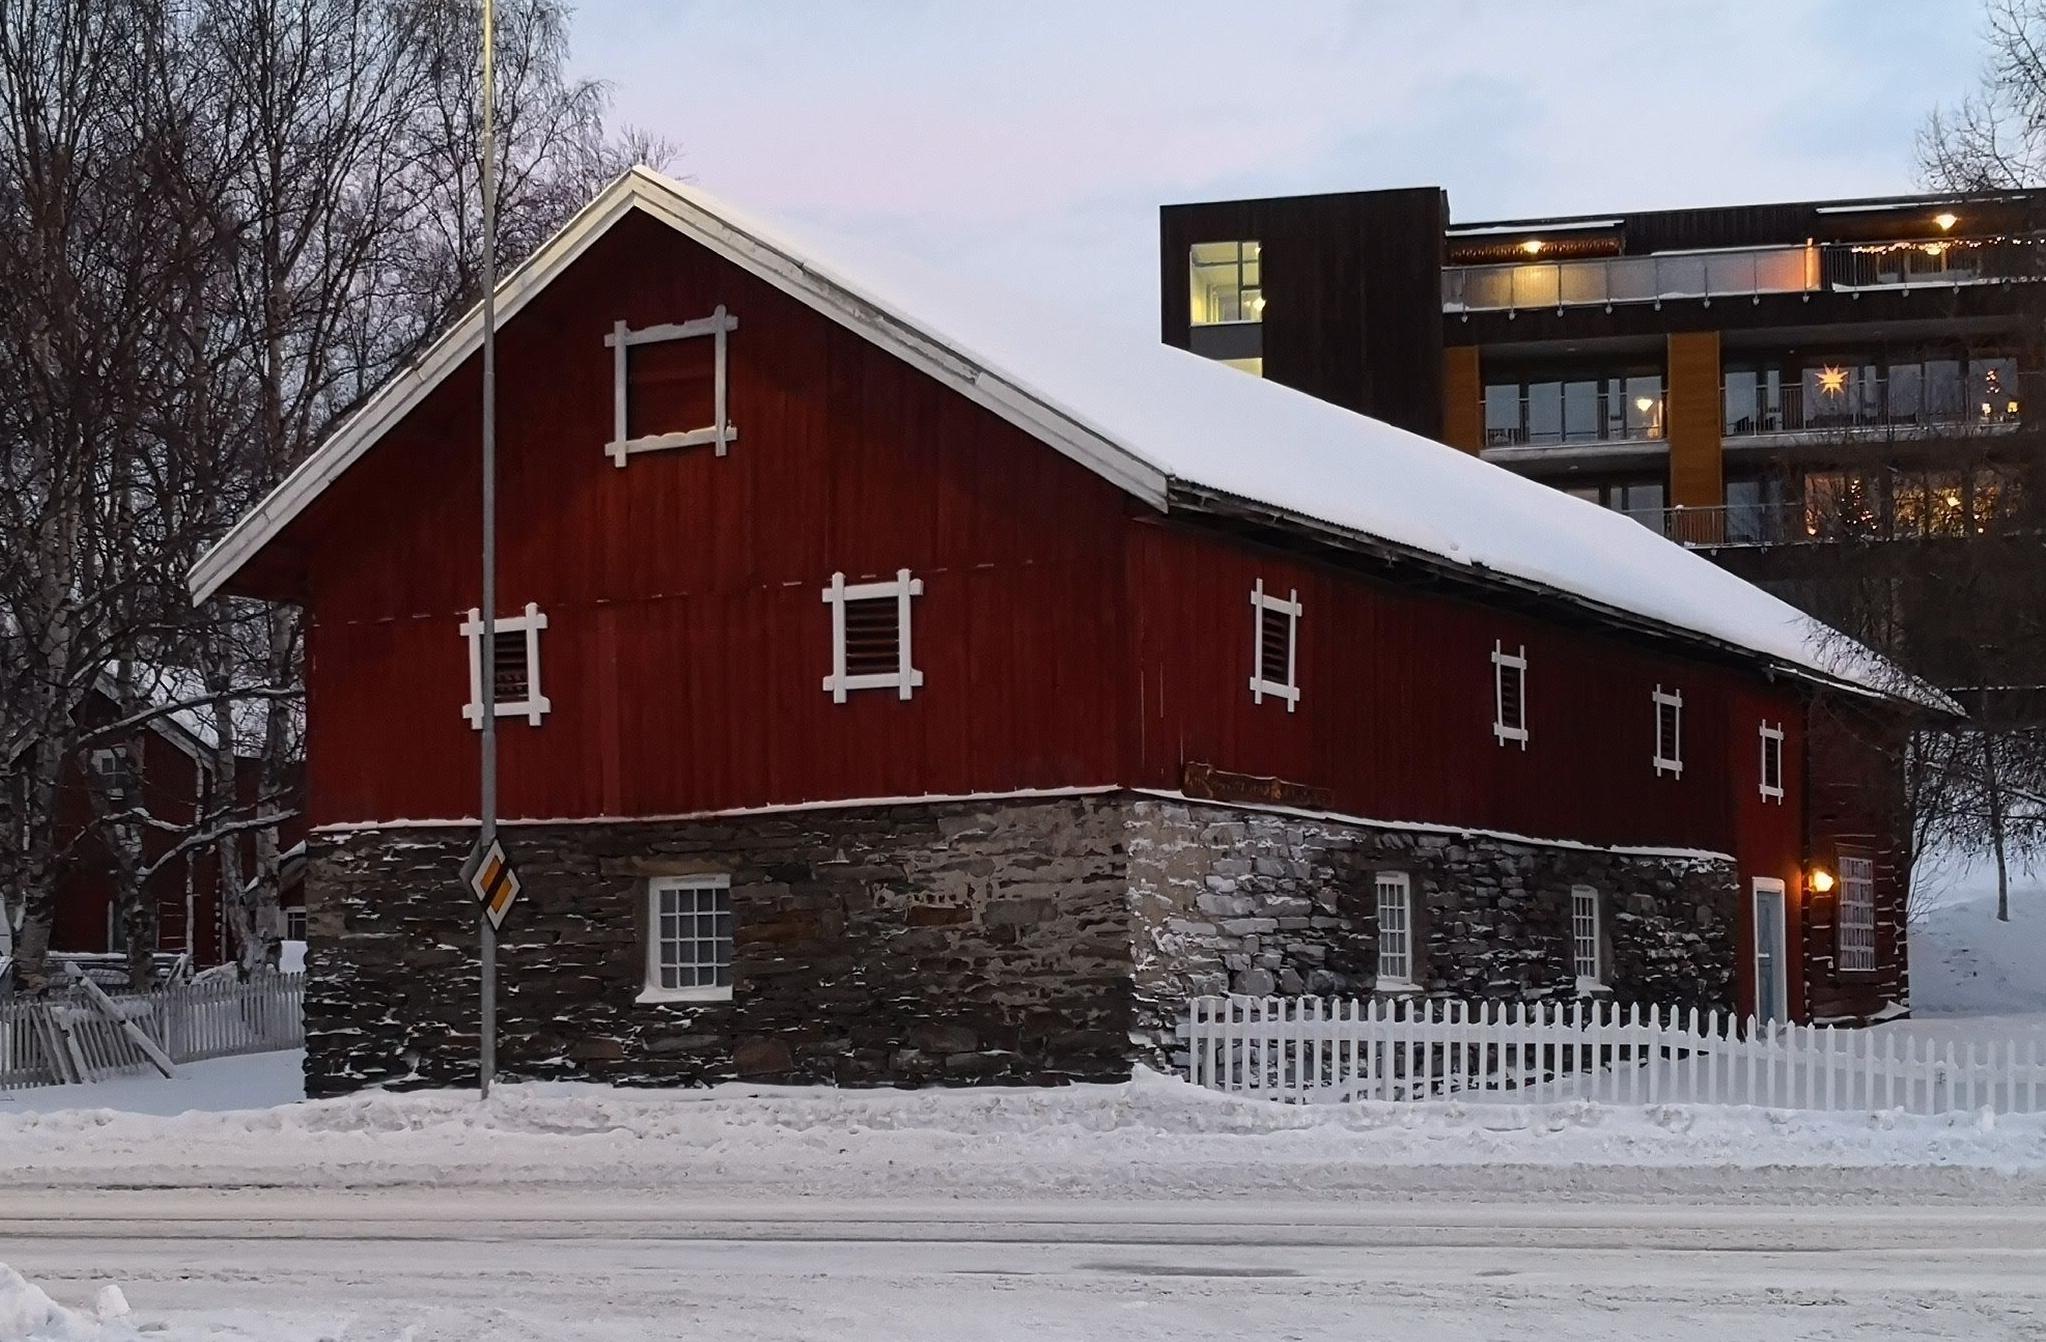 Fjøsbygningen på Ramsmoen, Tynset